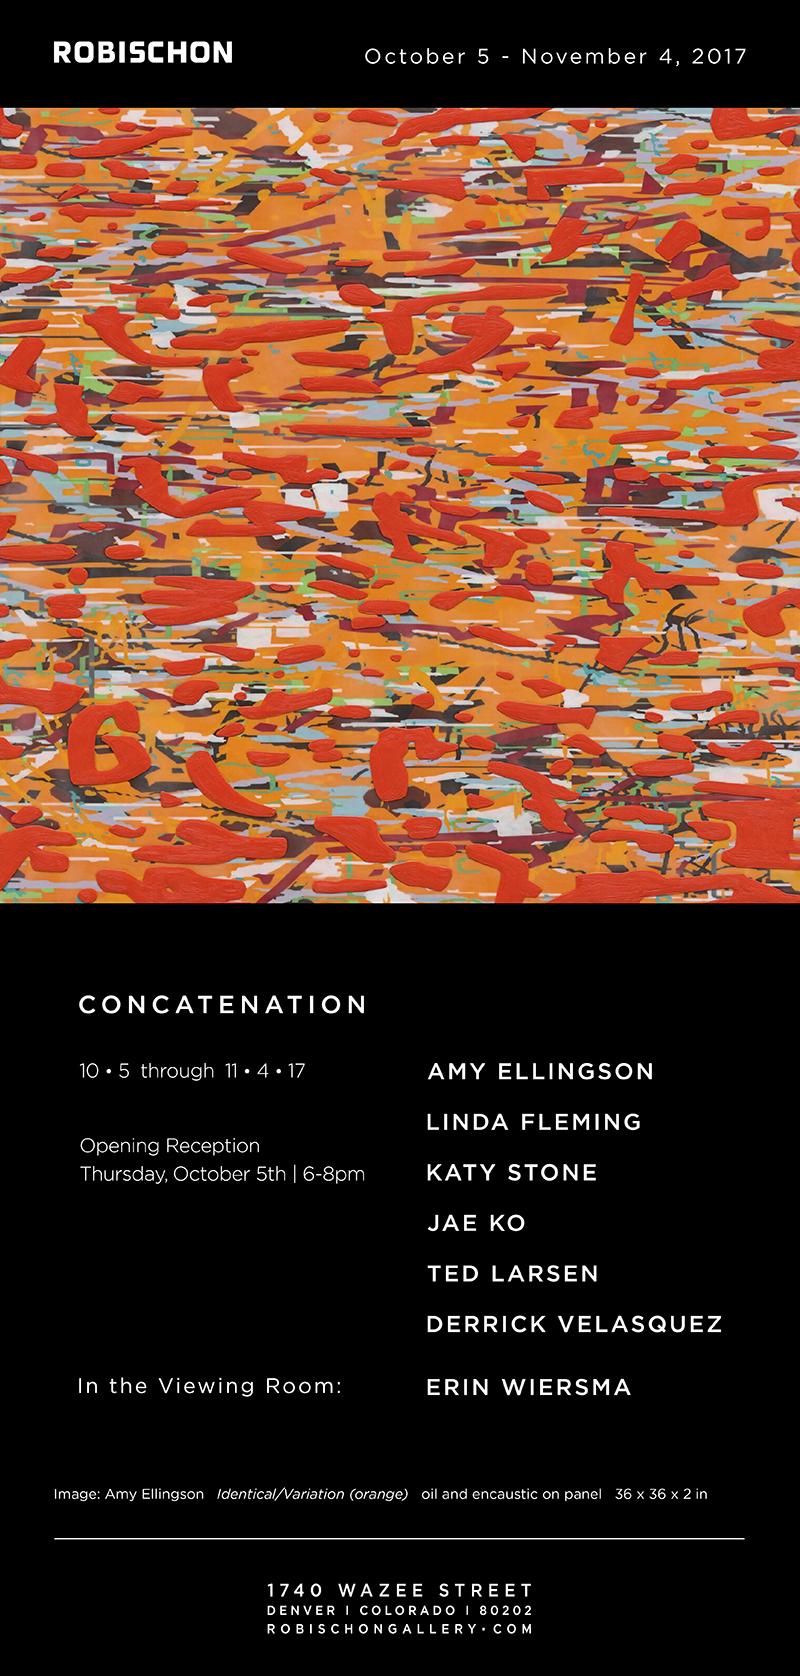 CONCATENATION_Email-ELLINGSON_ARTIST EMAIL - ELLINGSON 1-800px.jpg